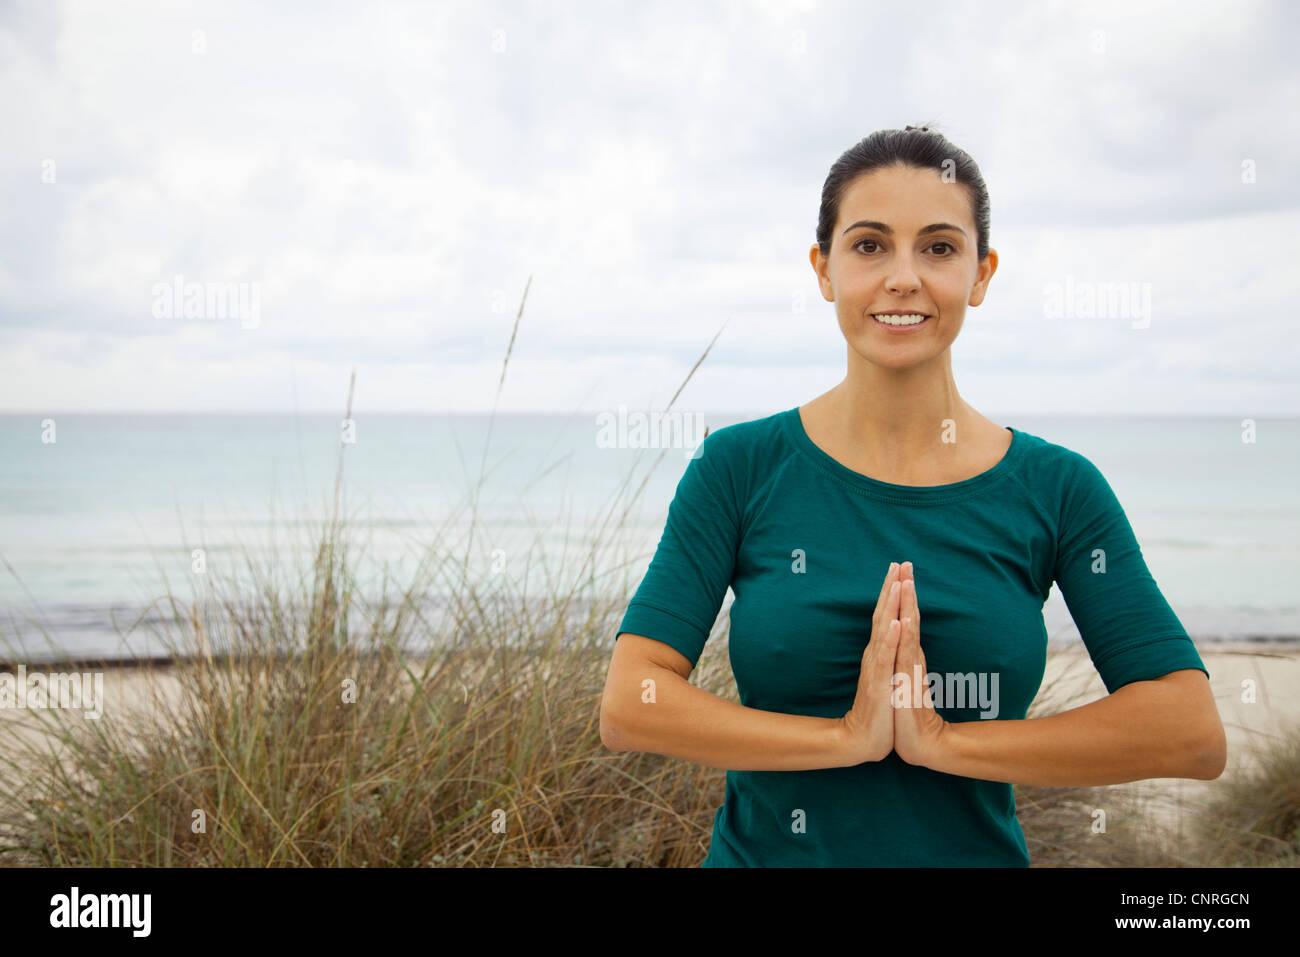 Mature woman practicing yoga on beach, portrait - Stock Image